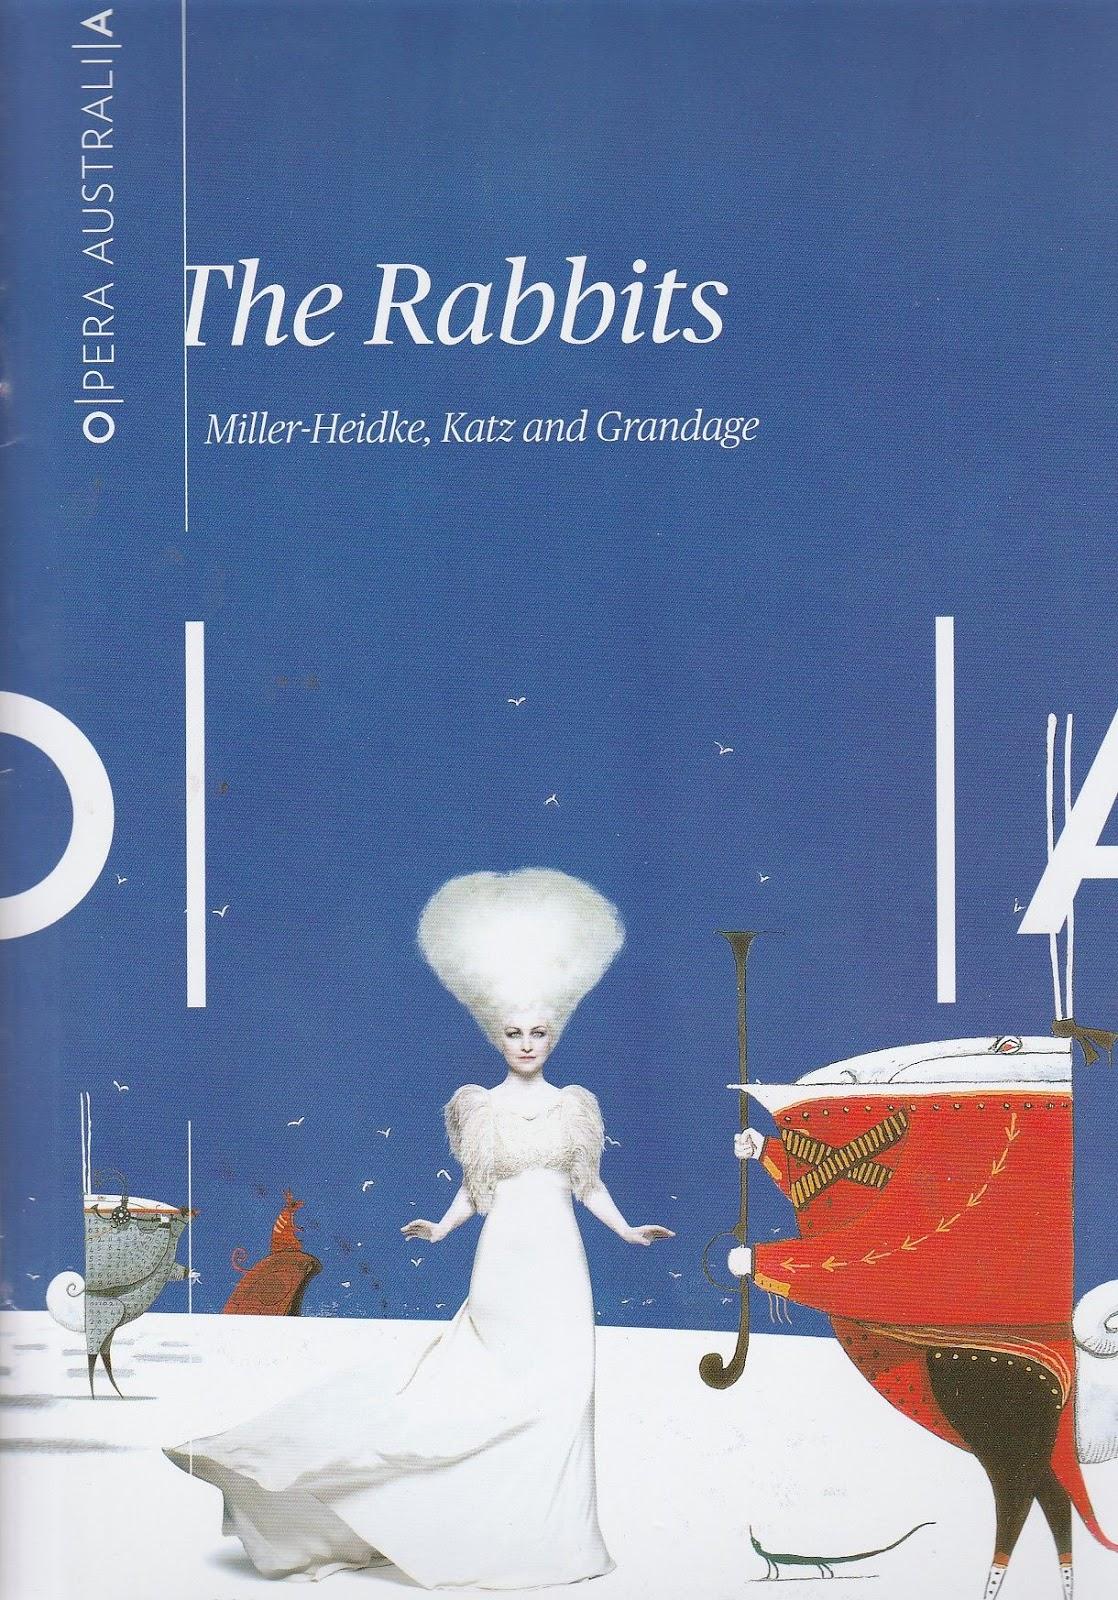 Canberra Critics Circle The Rabbits  Opera Australia